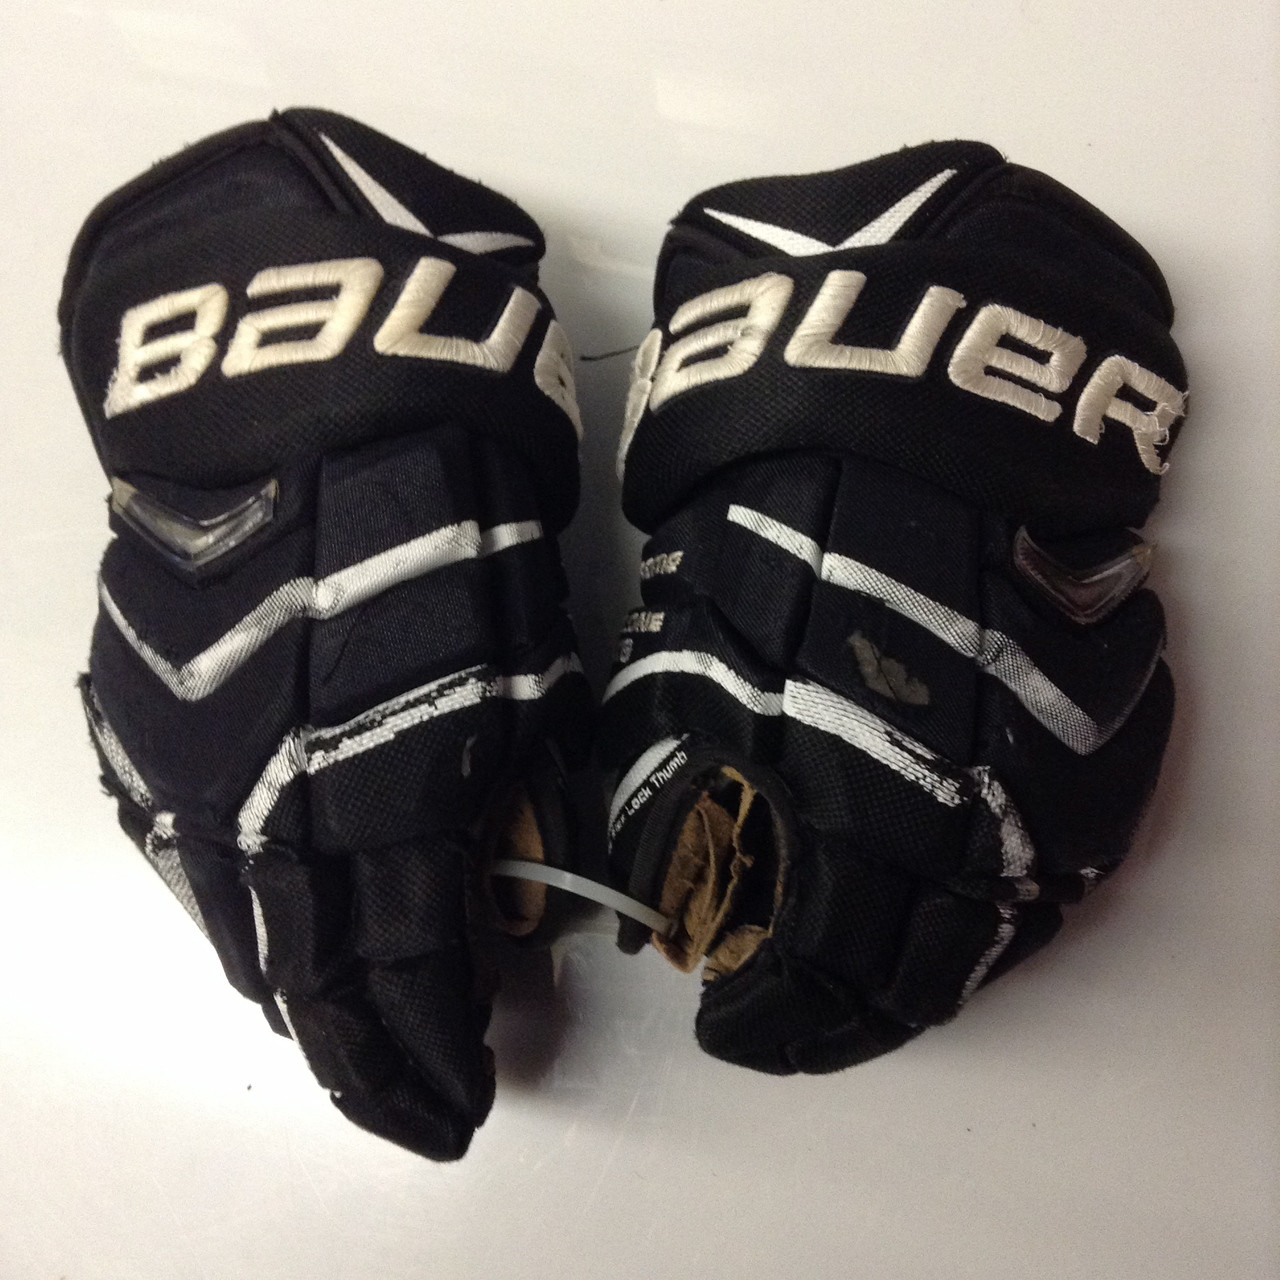 Bauer Supreme Totalone Nxg Pro Custom Pro Stock Hockey Gloves Used